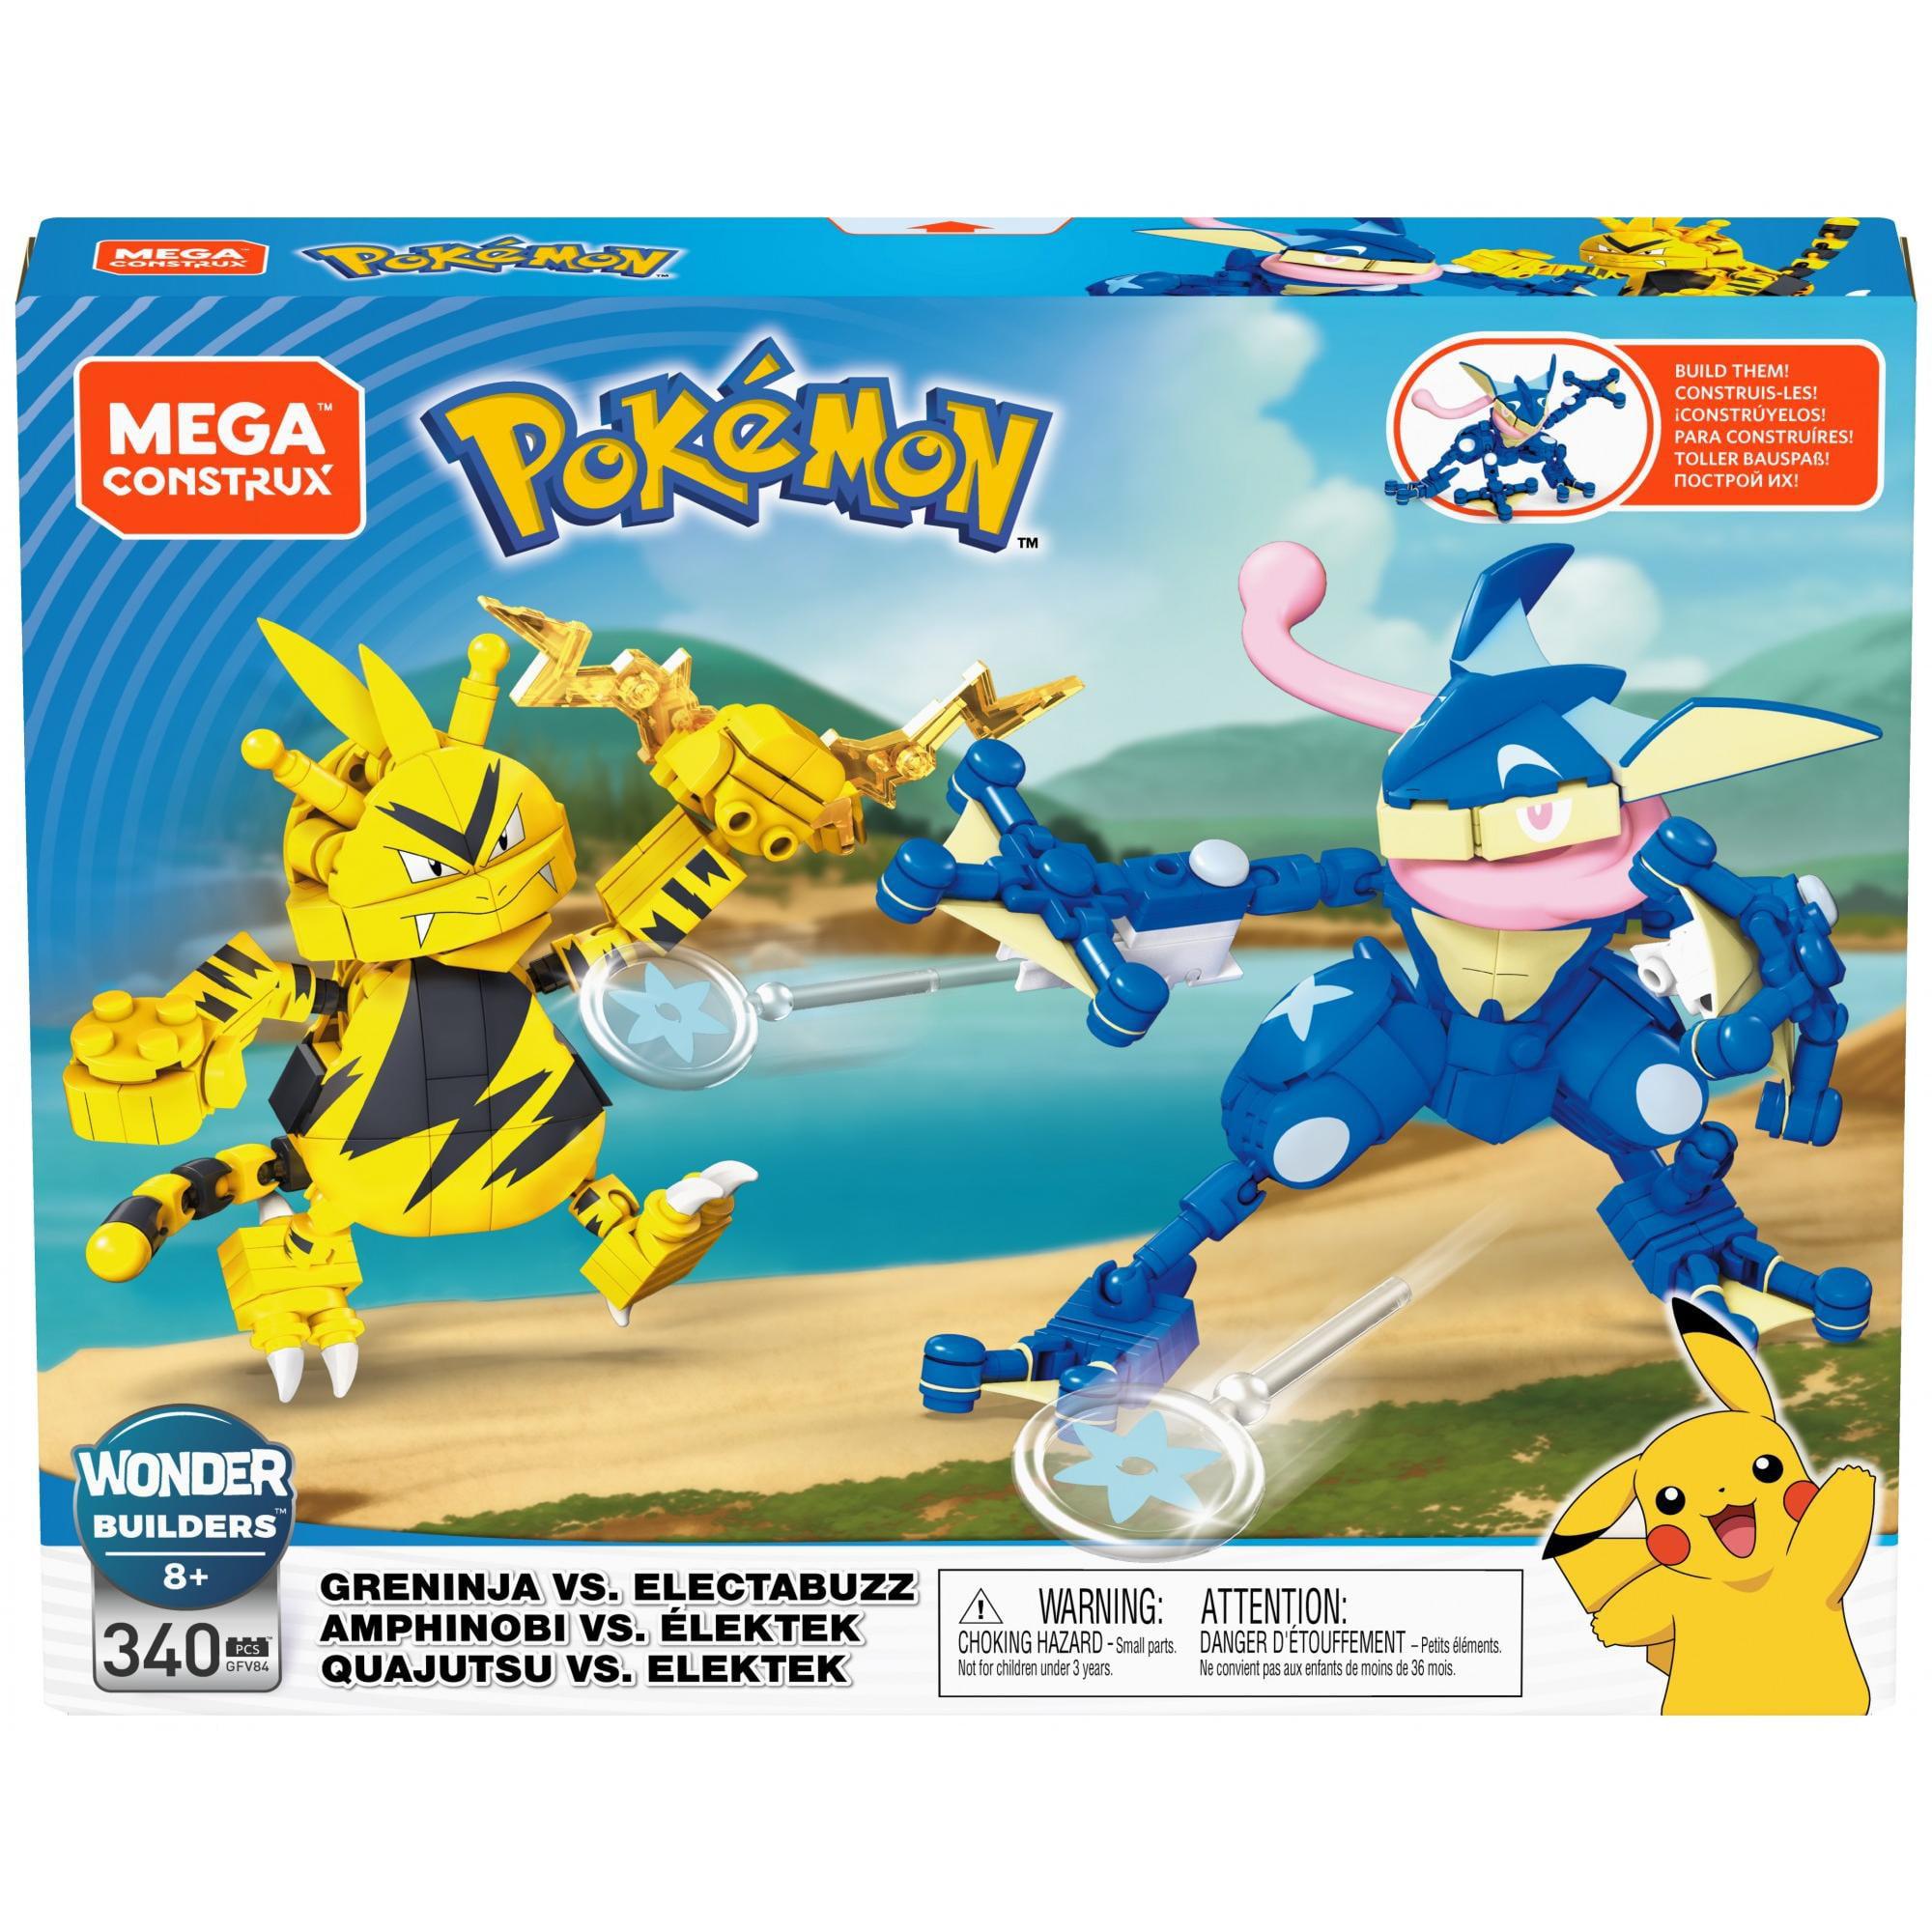 Mega Construx Pokemon Buildable Greninja vs. Electabuzz Figures